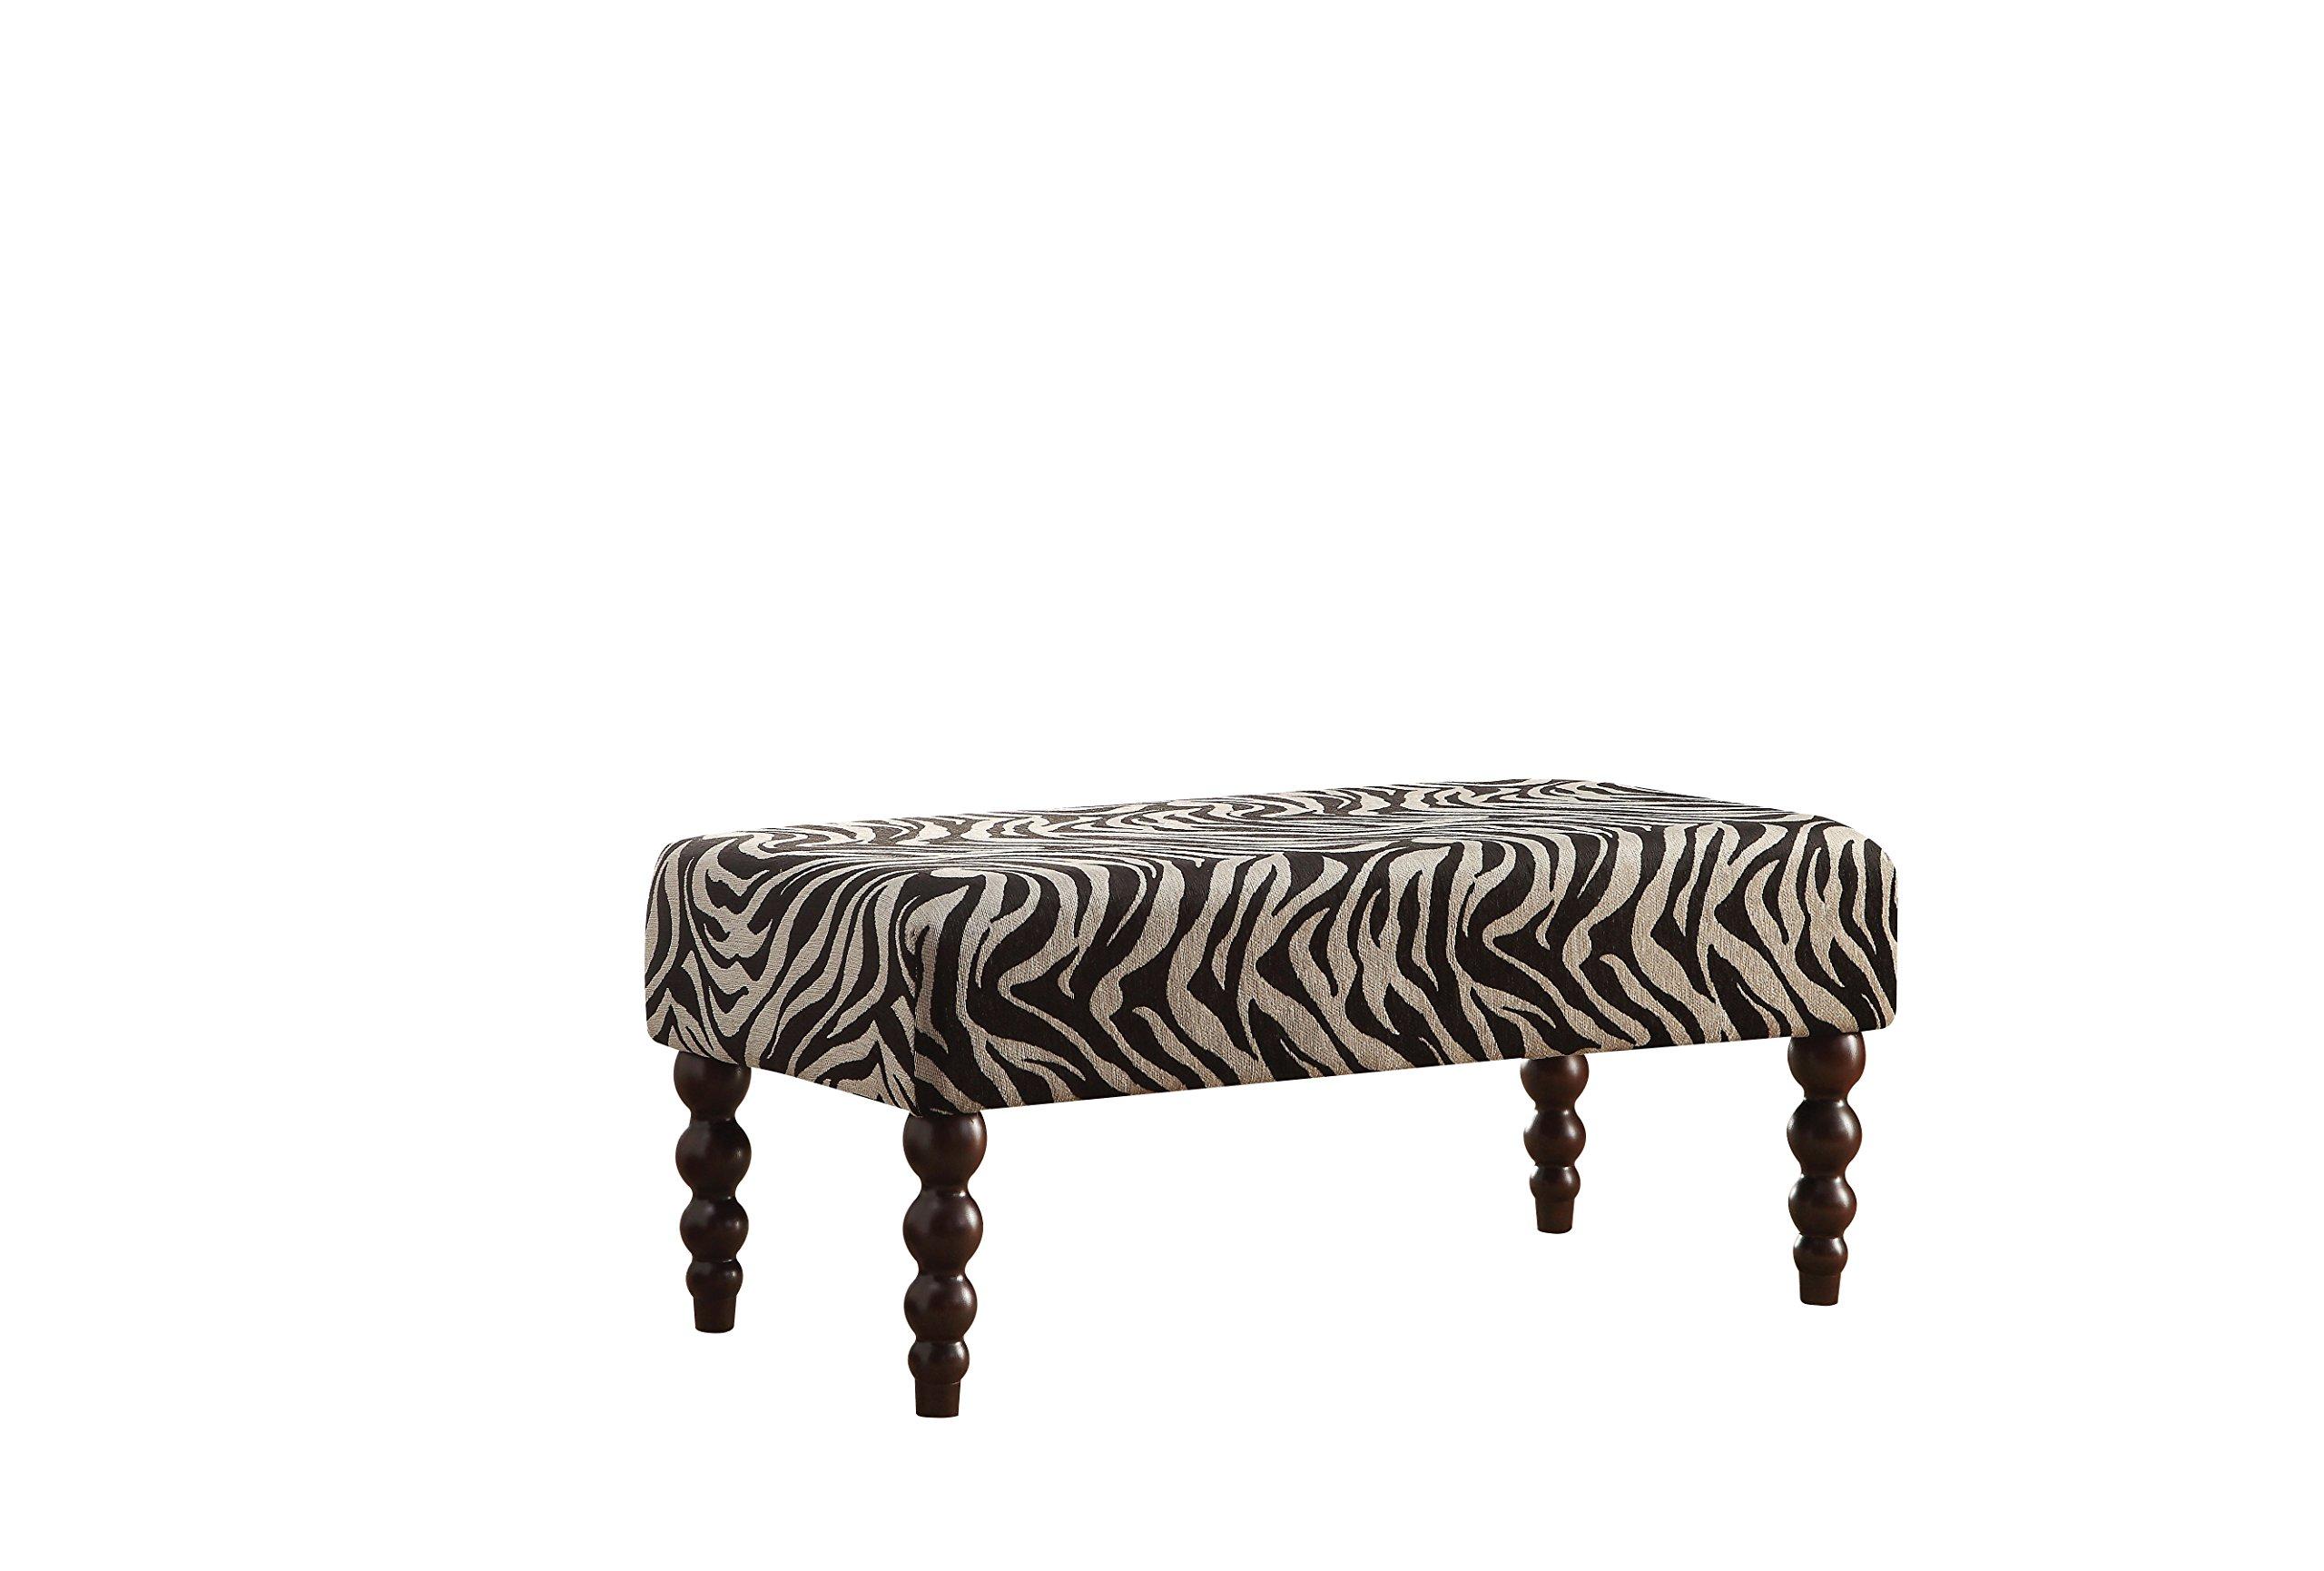 Acme Furniture 96626 Alysha Bench, Zebra Fabric